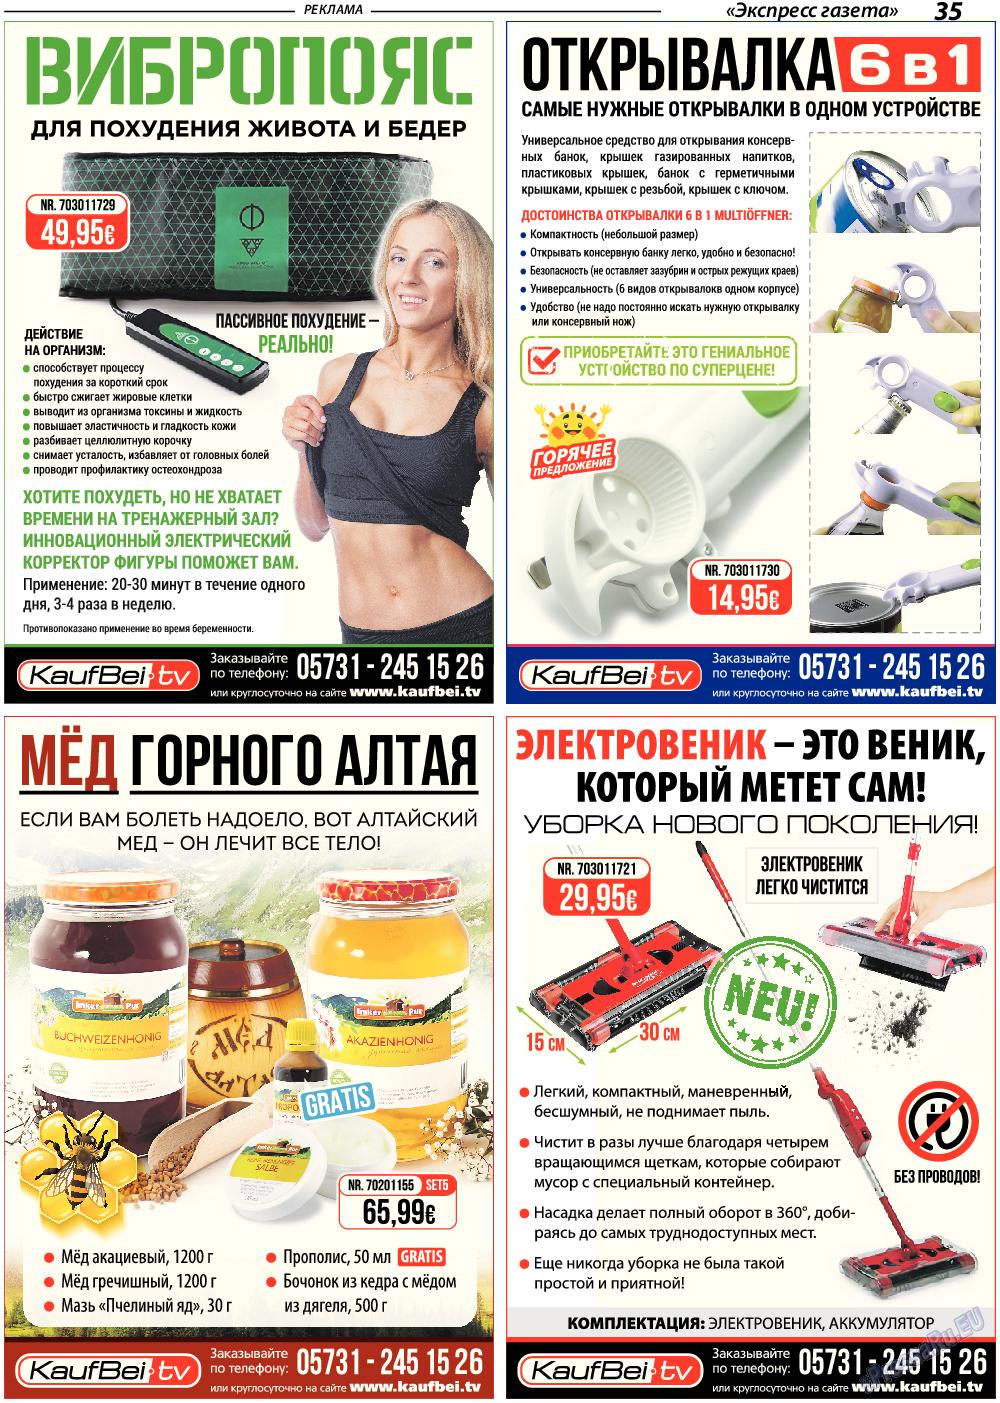 Экспресс газета (газета). 2017 год, номер 8, стр. 35